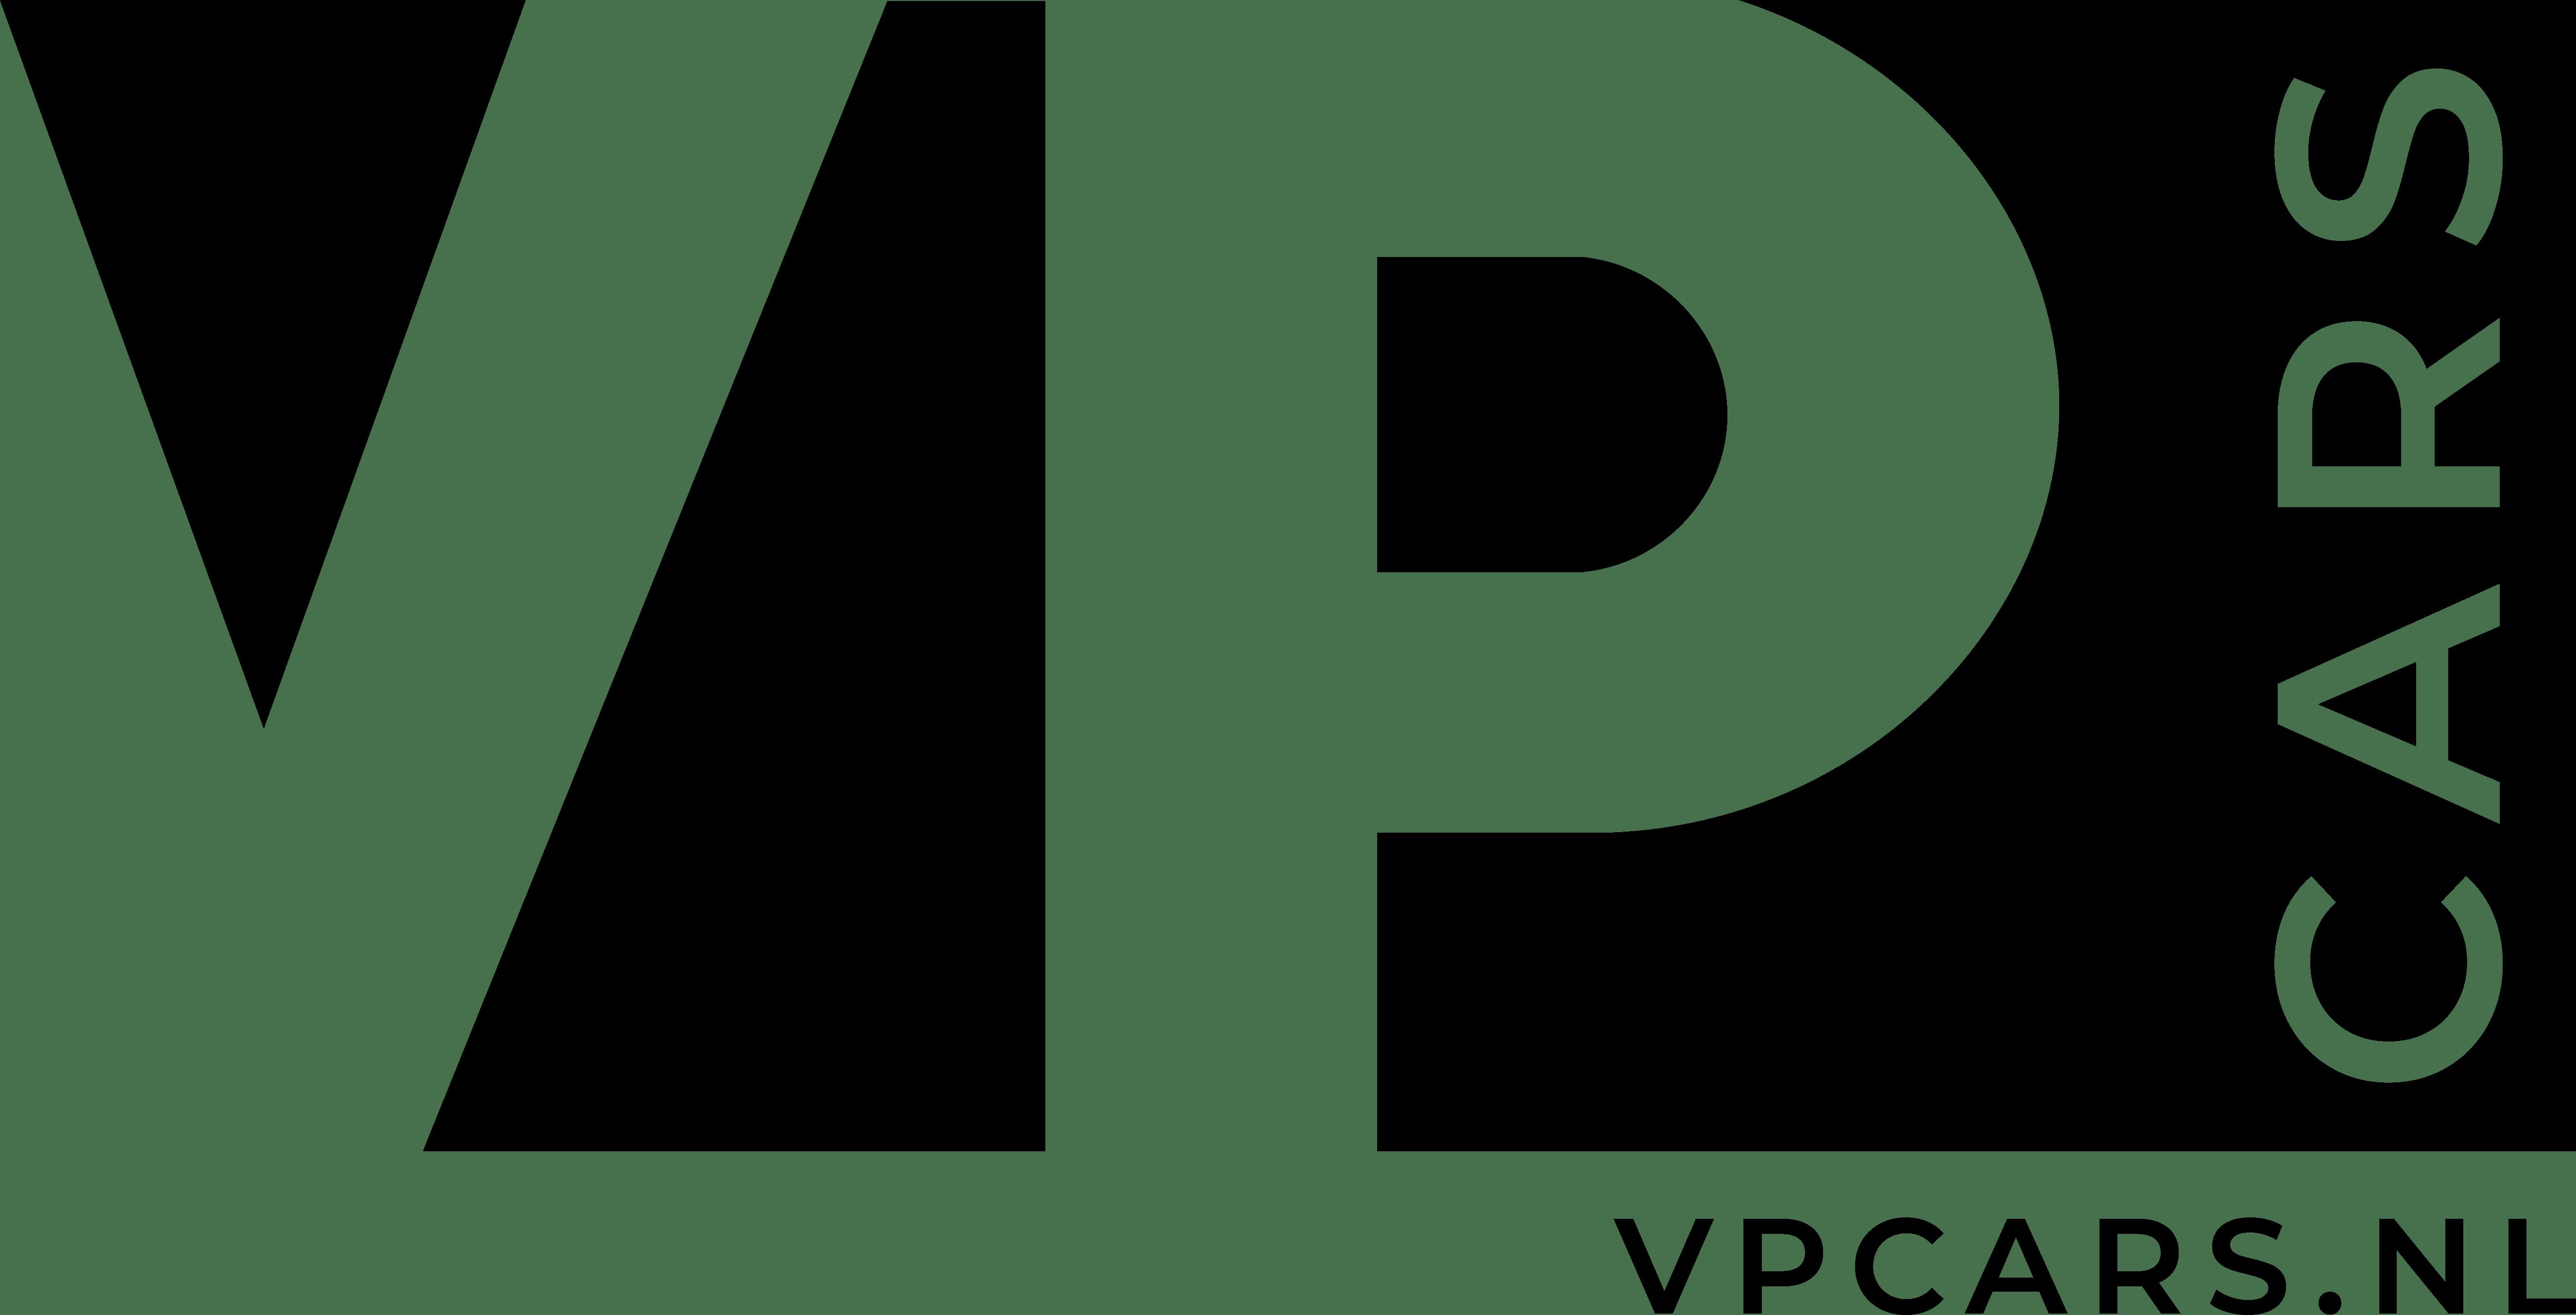 vpcars